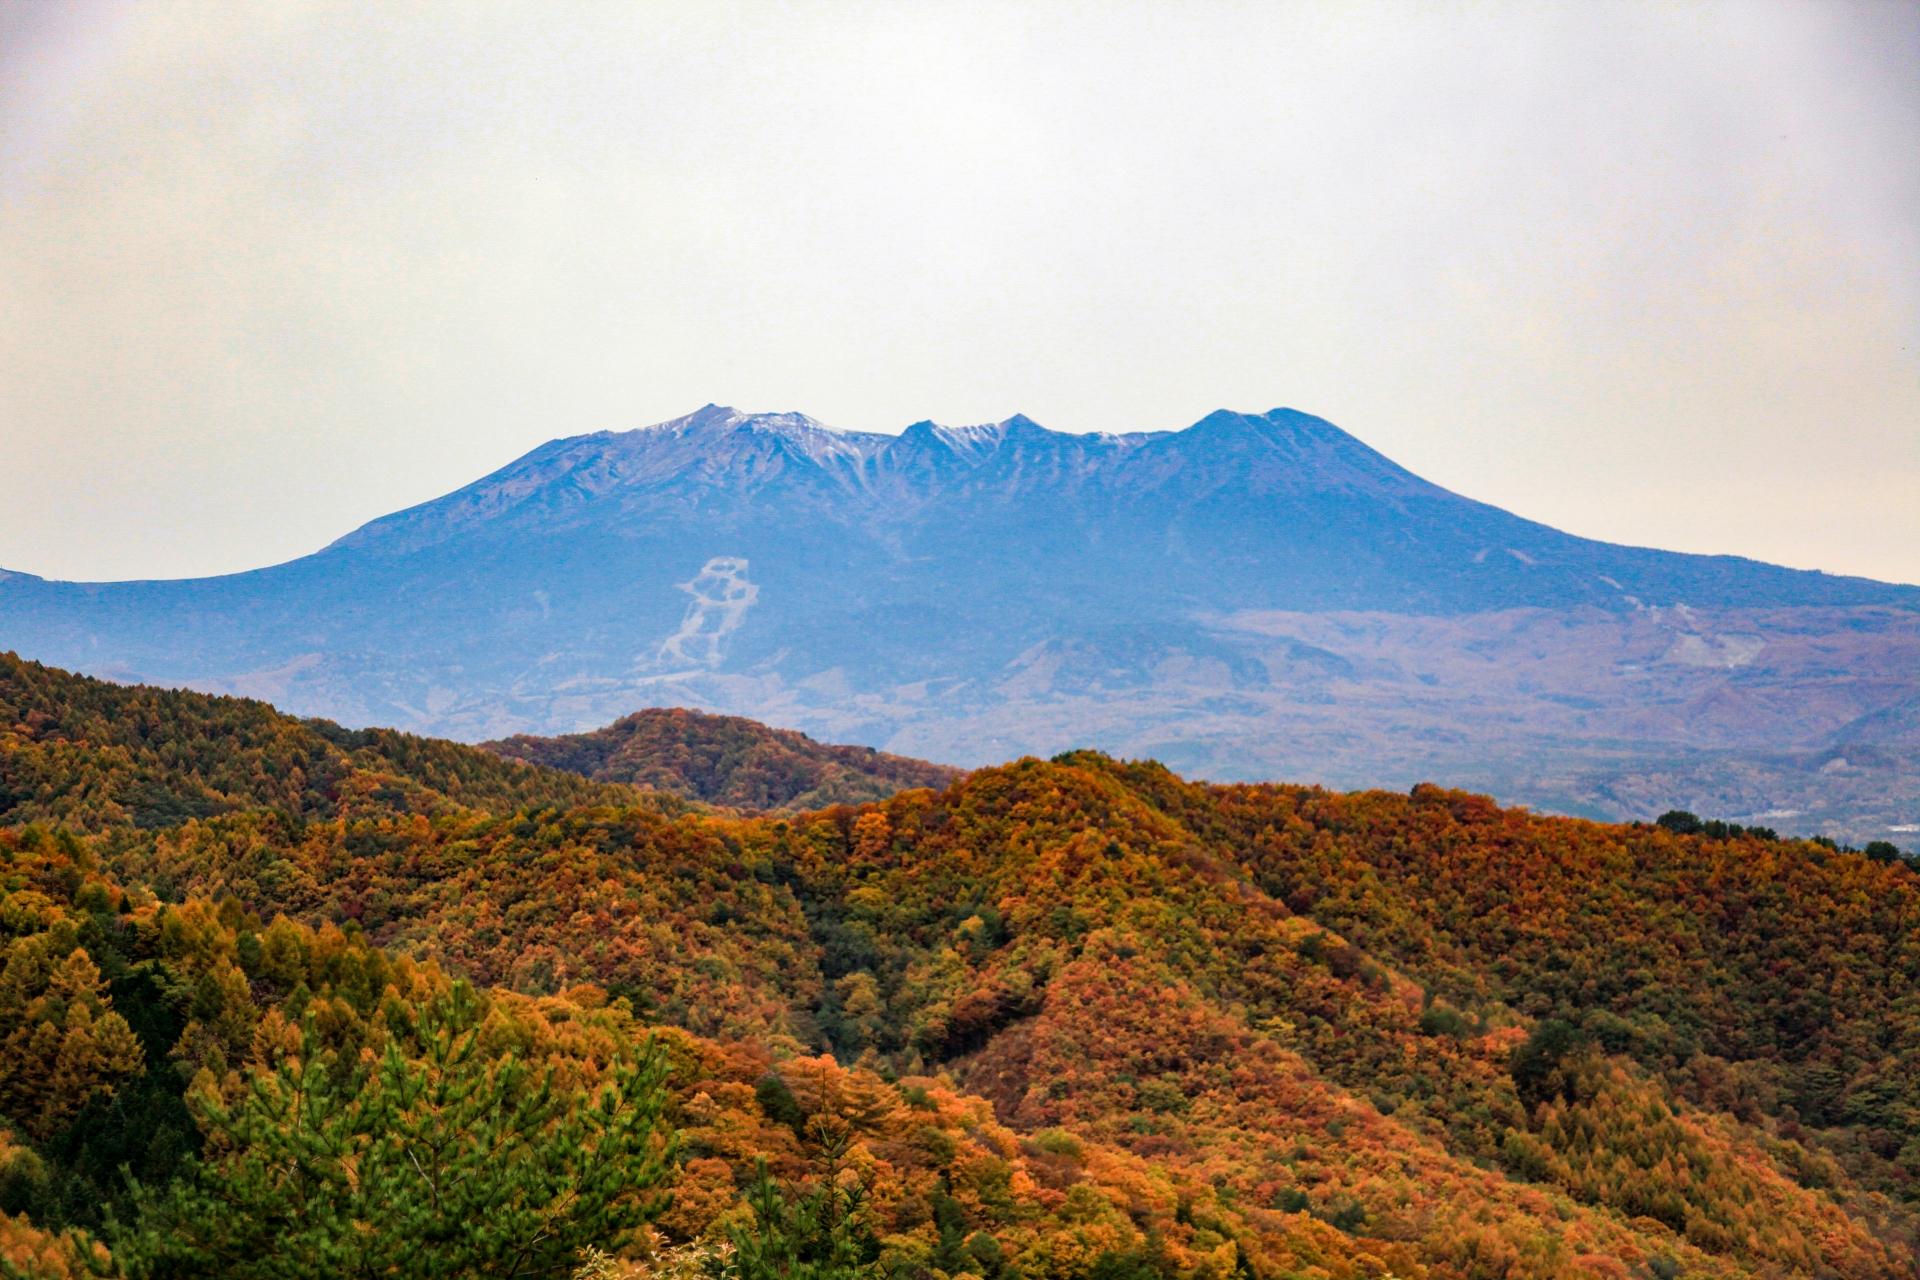 Kiso Ontake: Japan's Pristine Heartland